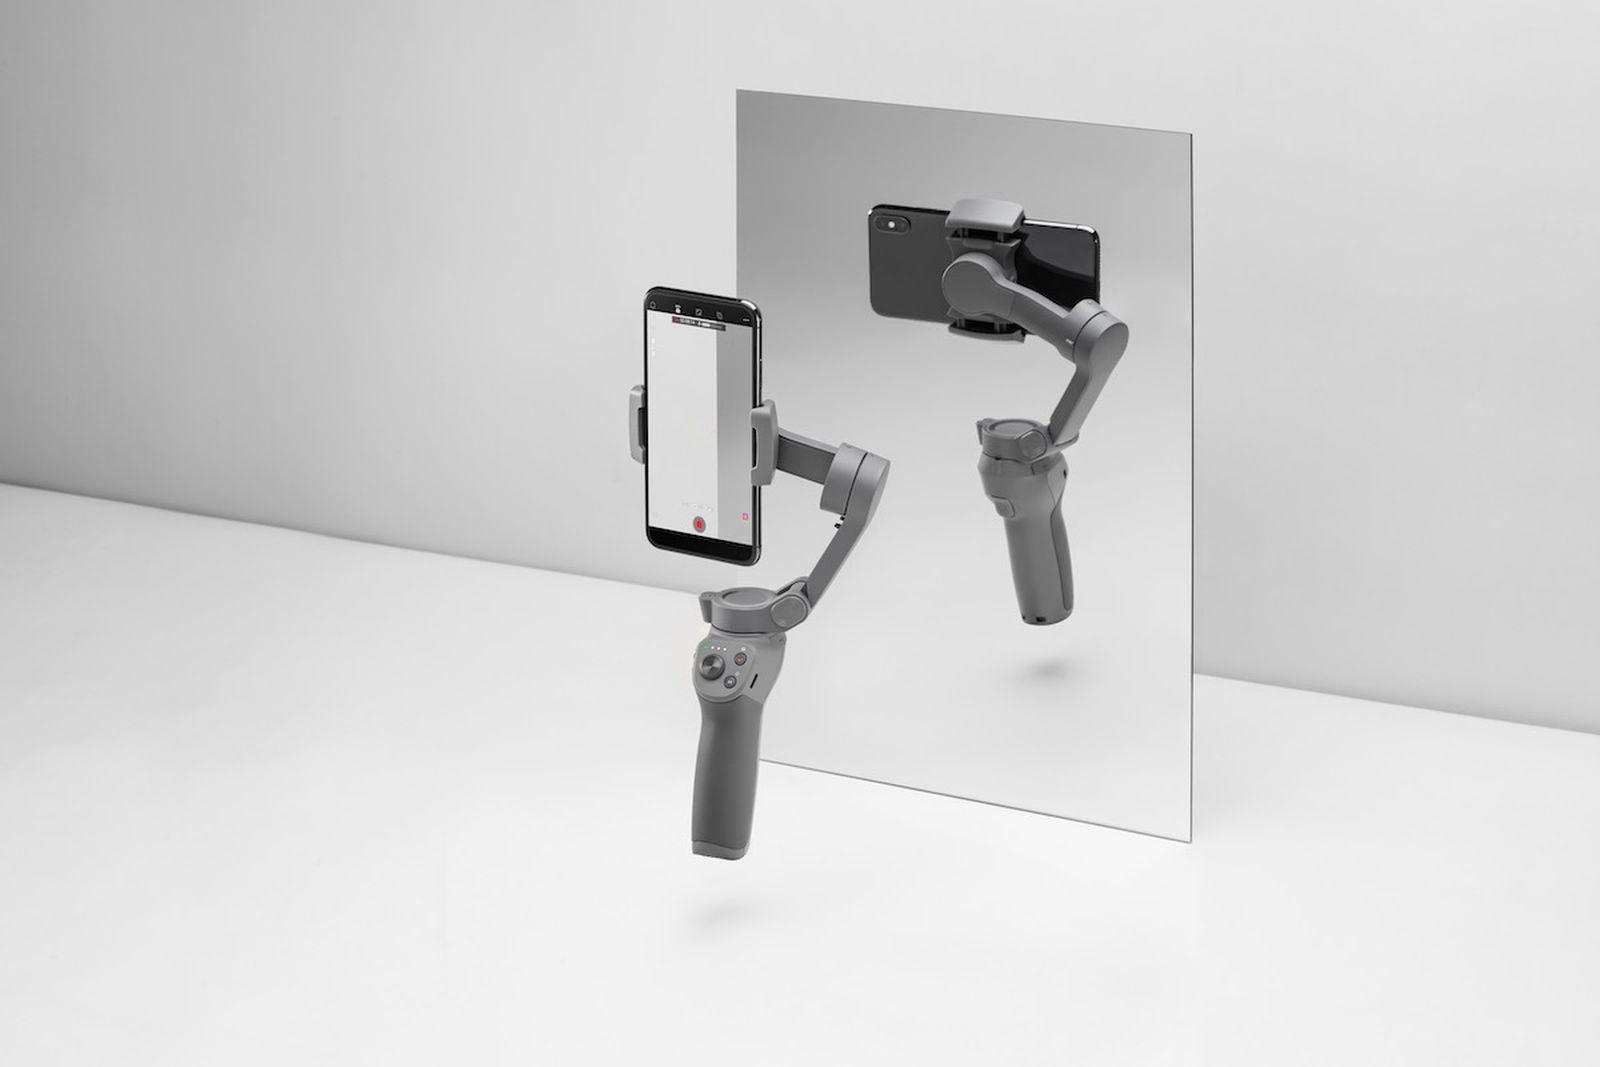 dji osmo mobile 3 phone stabilizer